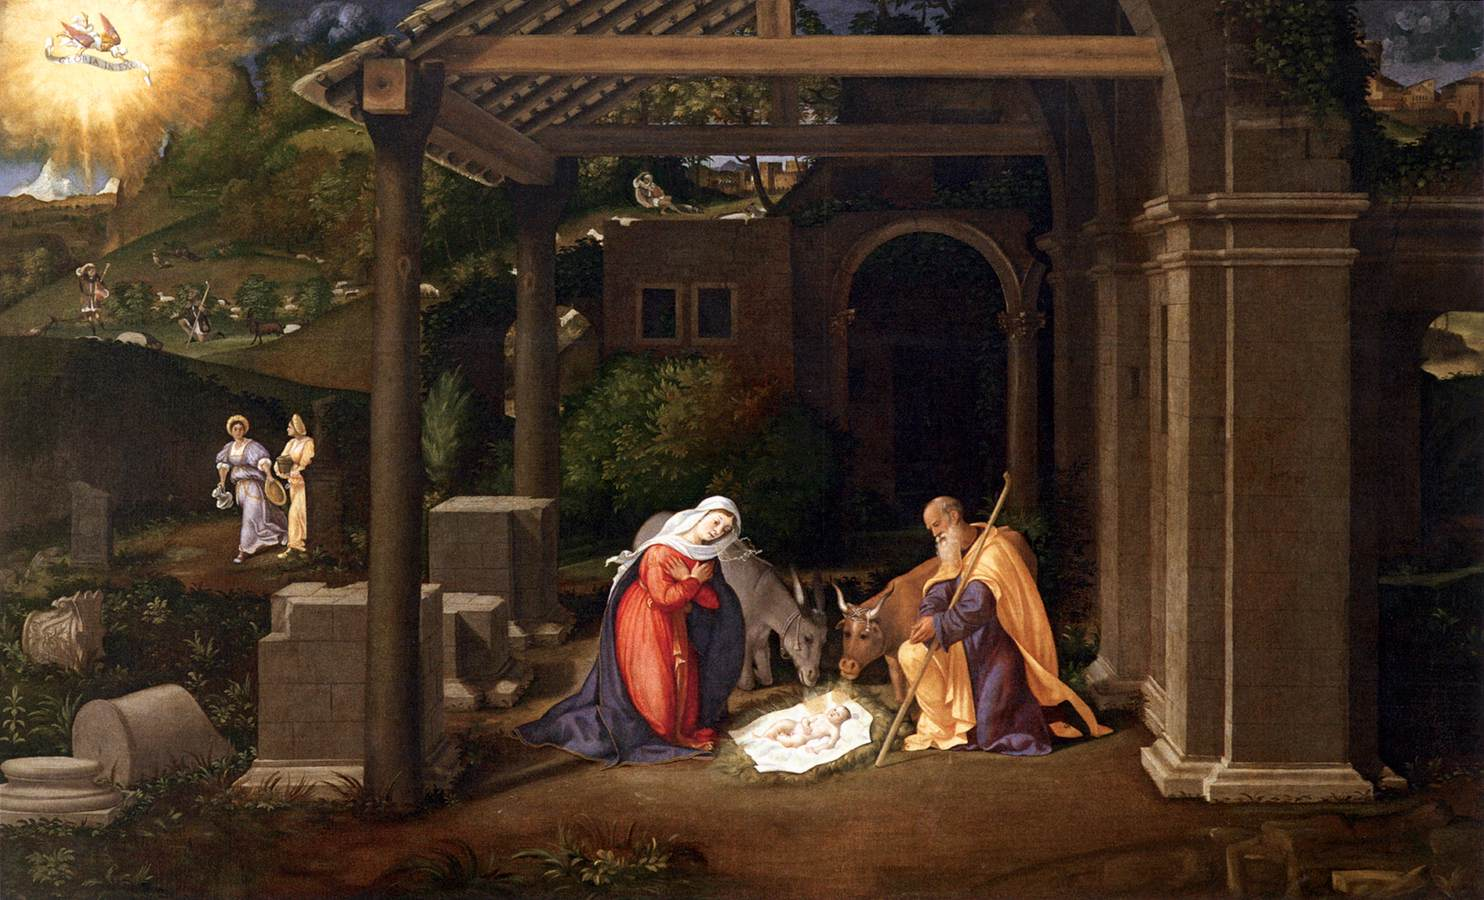 https://upload.wikimedia.org/wikipedia/commons/c/ca/Andrea_Previtali_-_Nativity_-_WGA18404.jpg